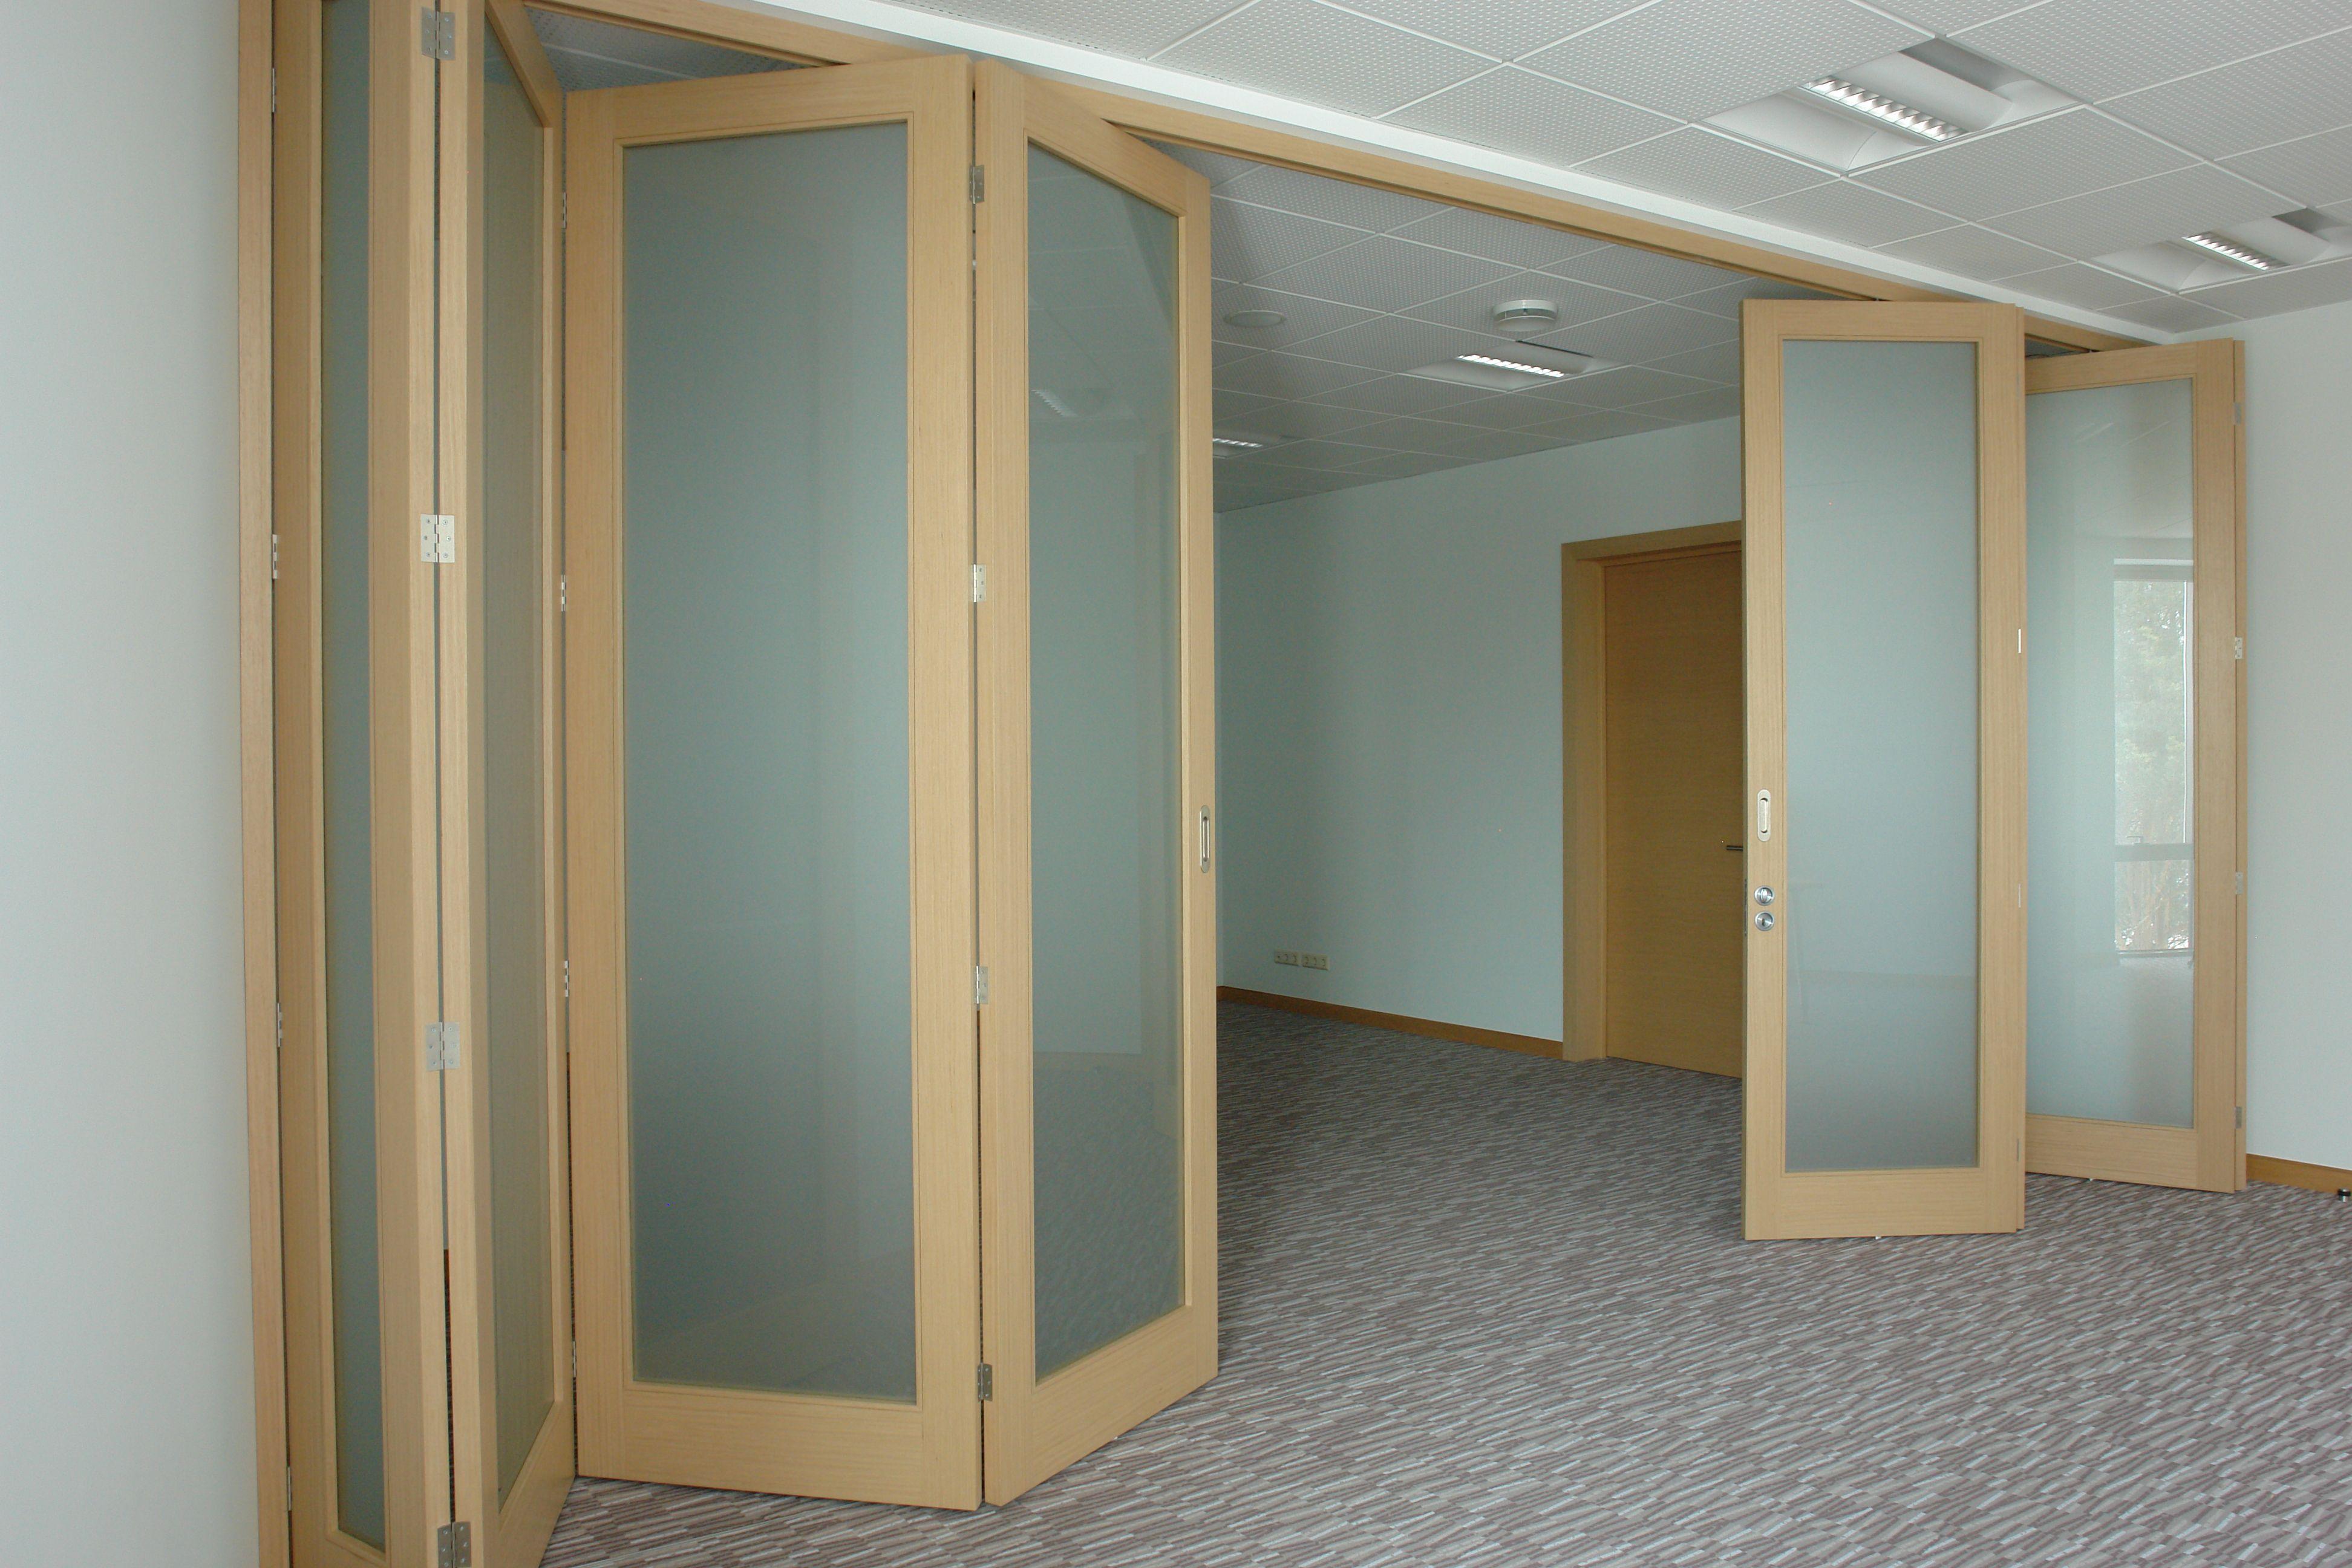 Produkti Folding Partitions Folding Panel Walls Starpsiena Lv Room Divider Doors Glass Partition Wall Folding Partition